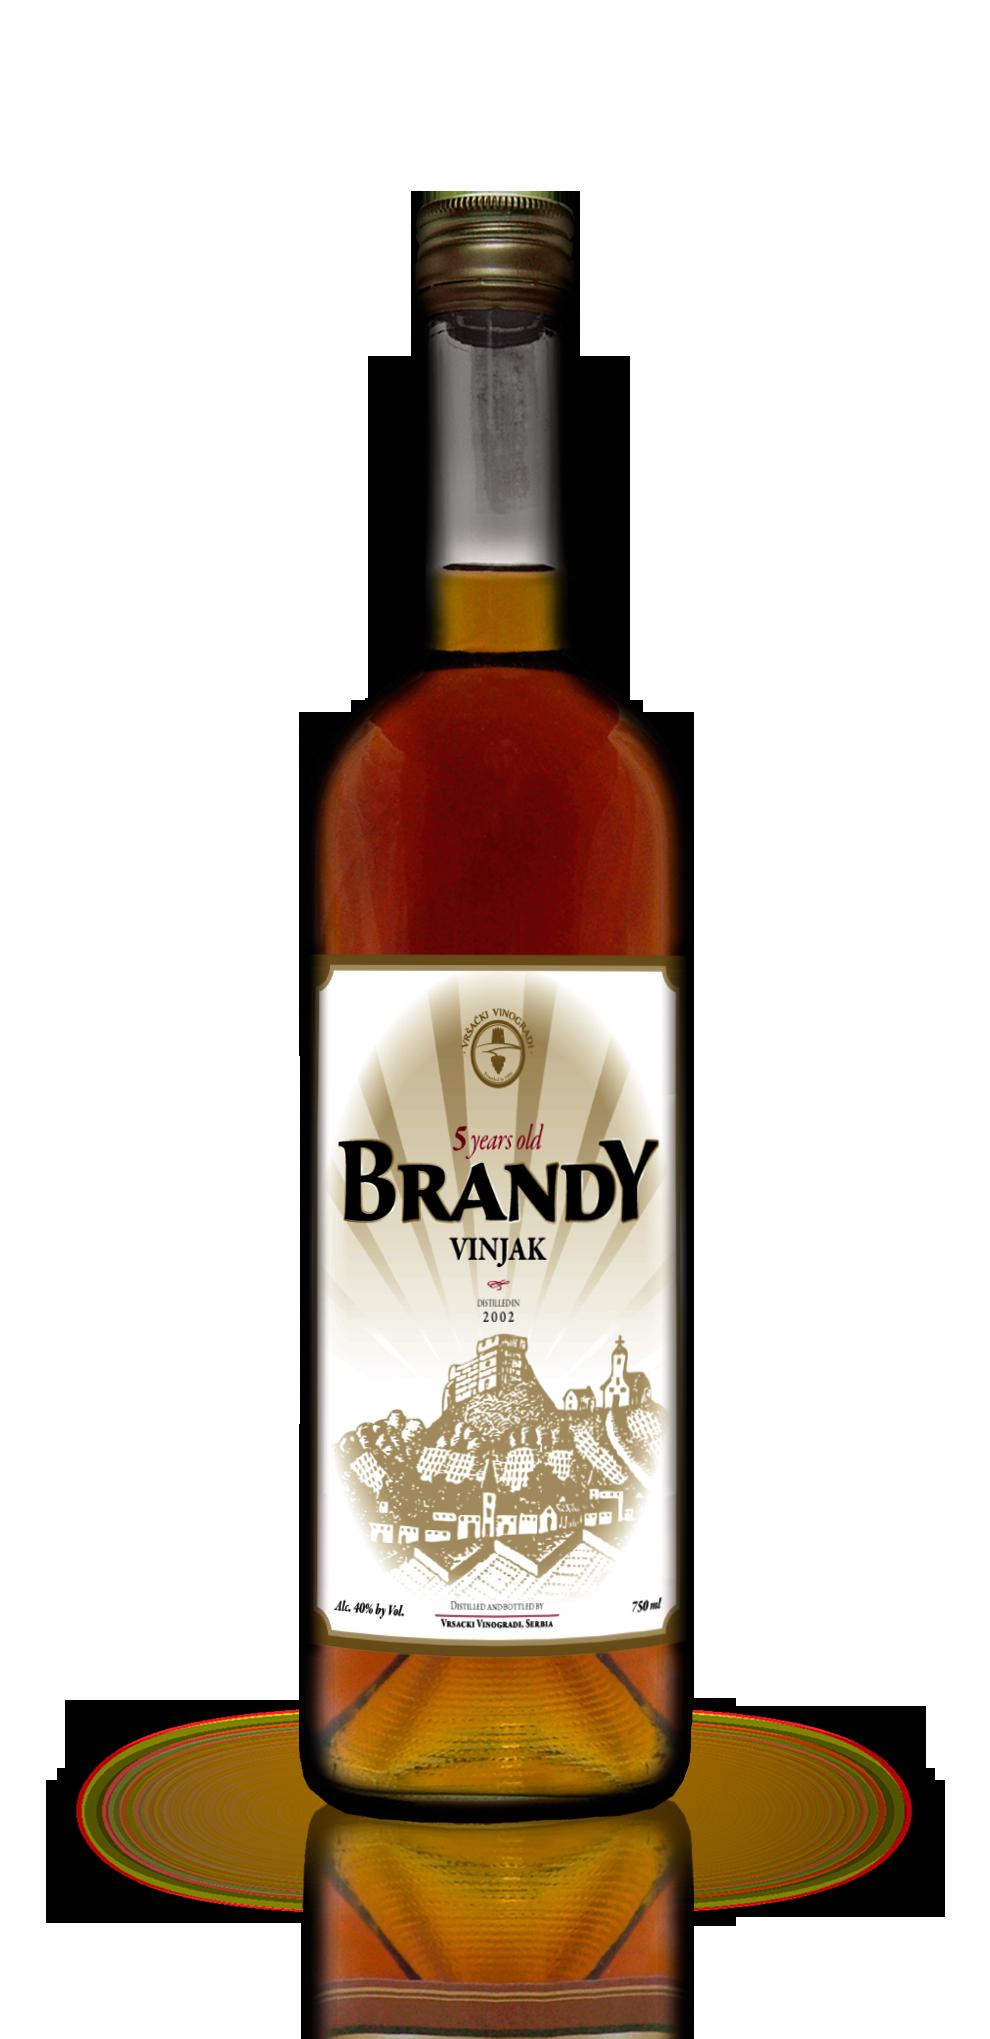 Brandy Vinjak